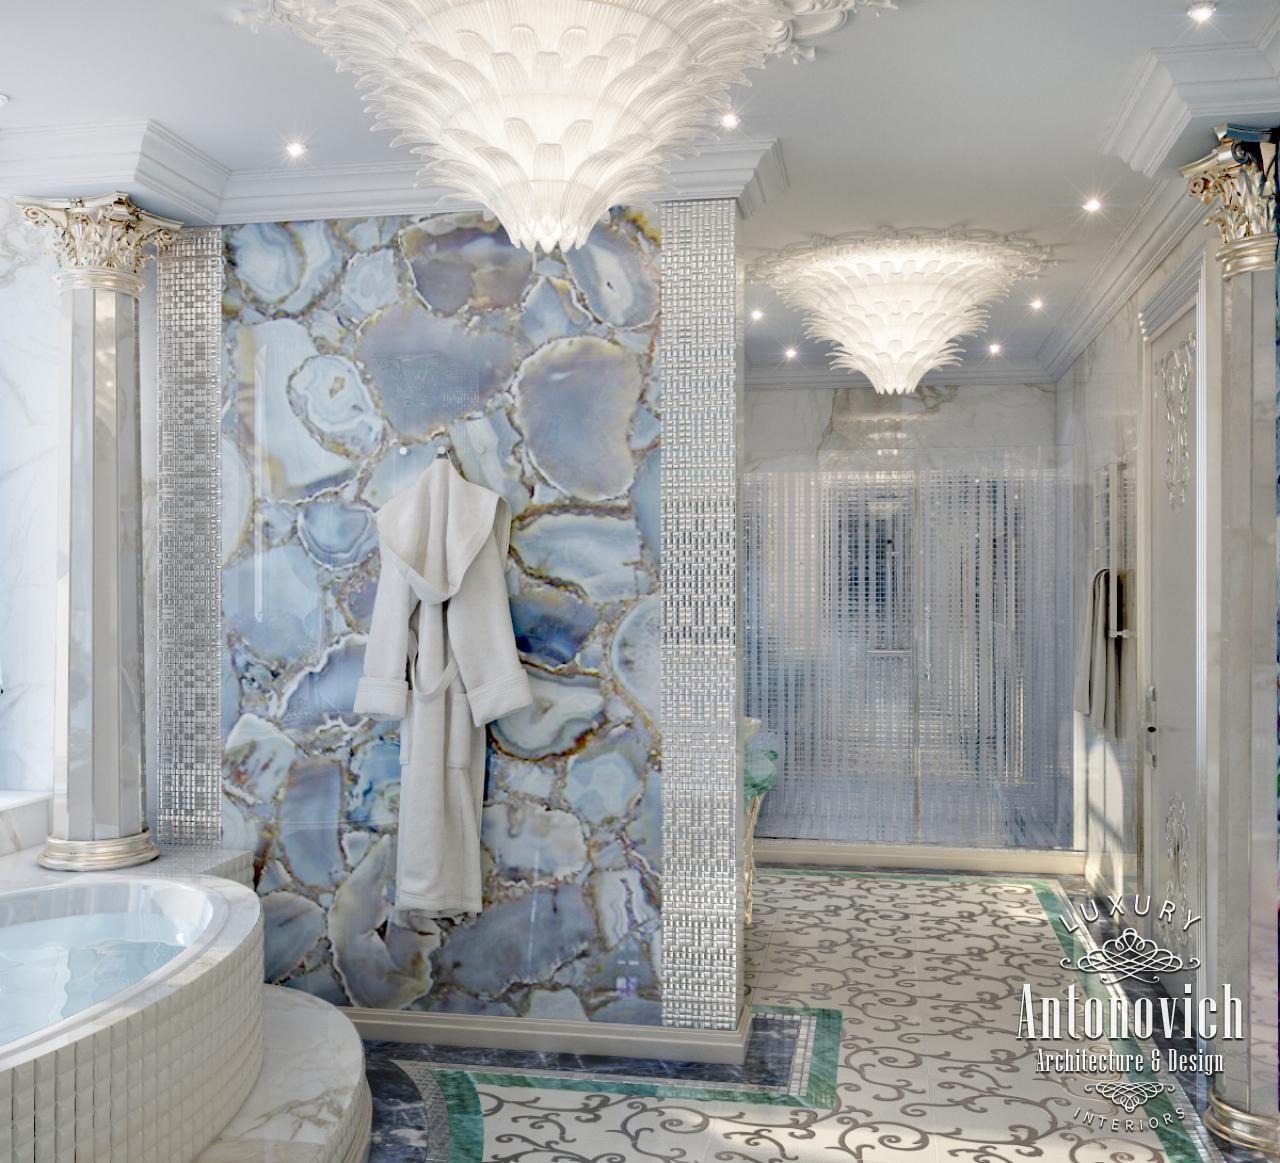 Bathroom Design In Dubai, Luxury Bathroom Abu Dhabi, Photo